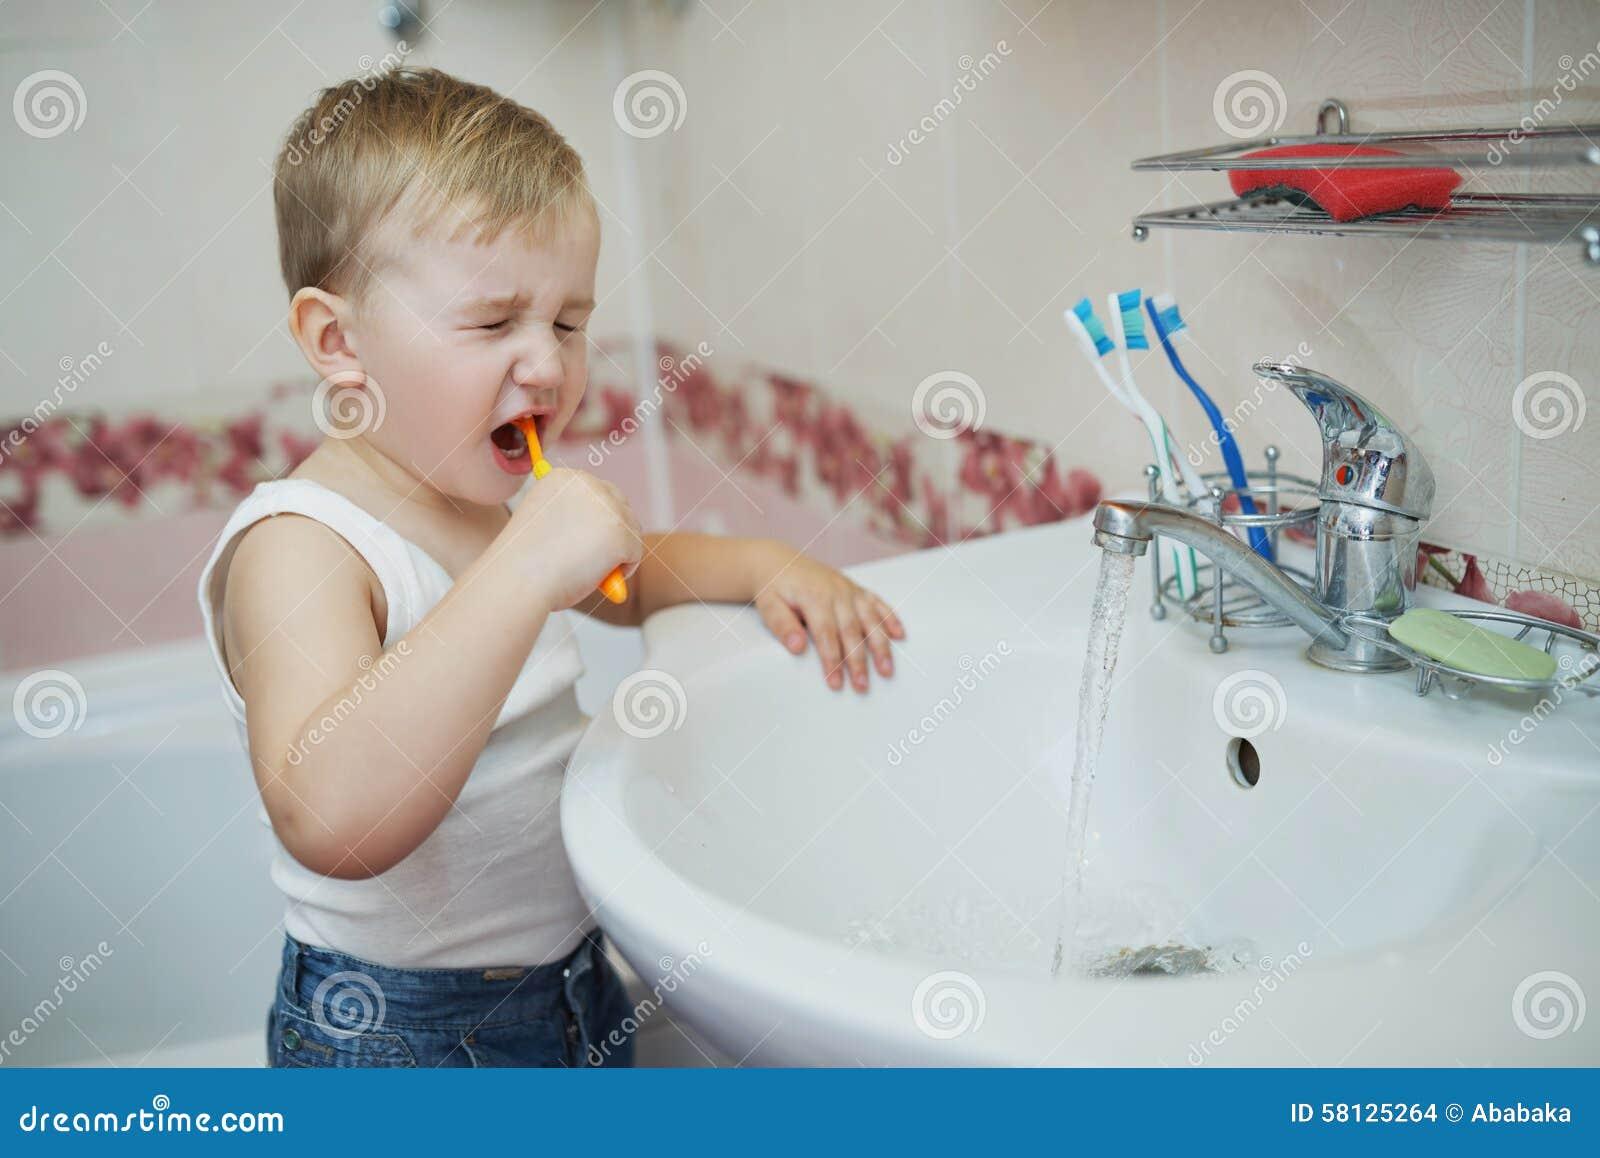 Little boy learns to brush teeth